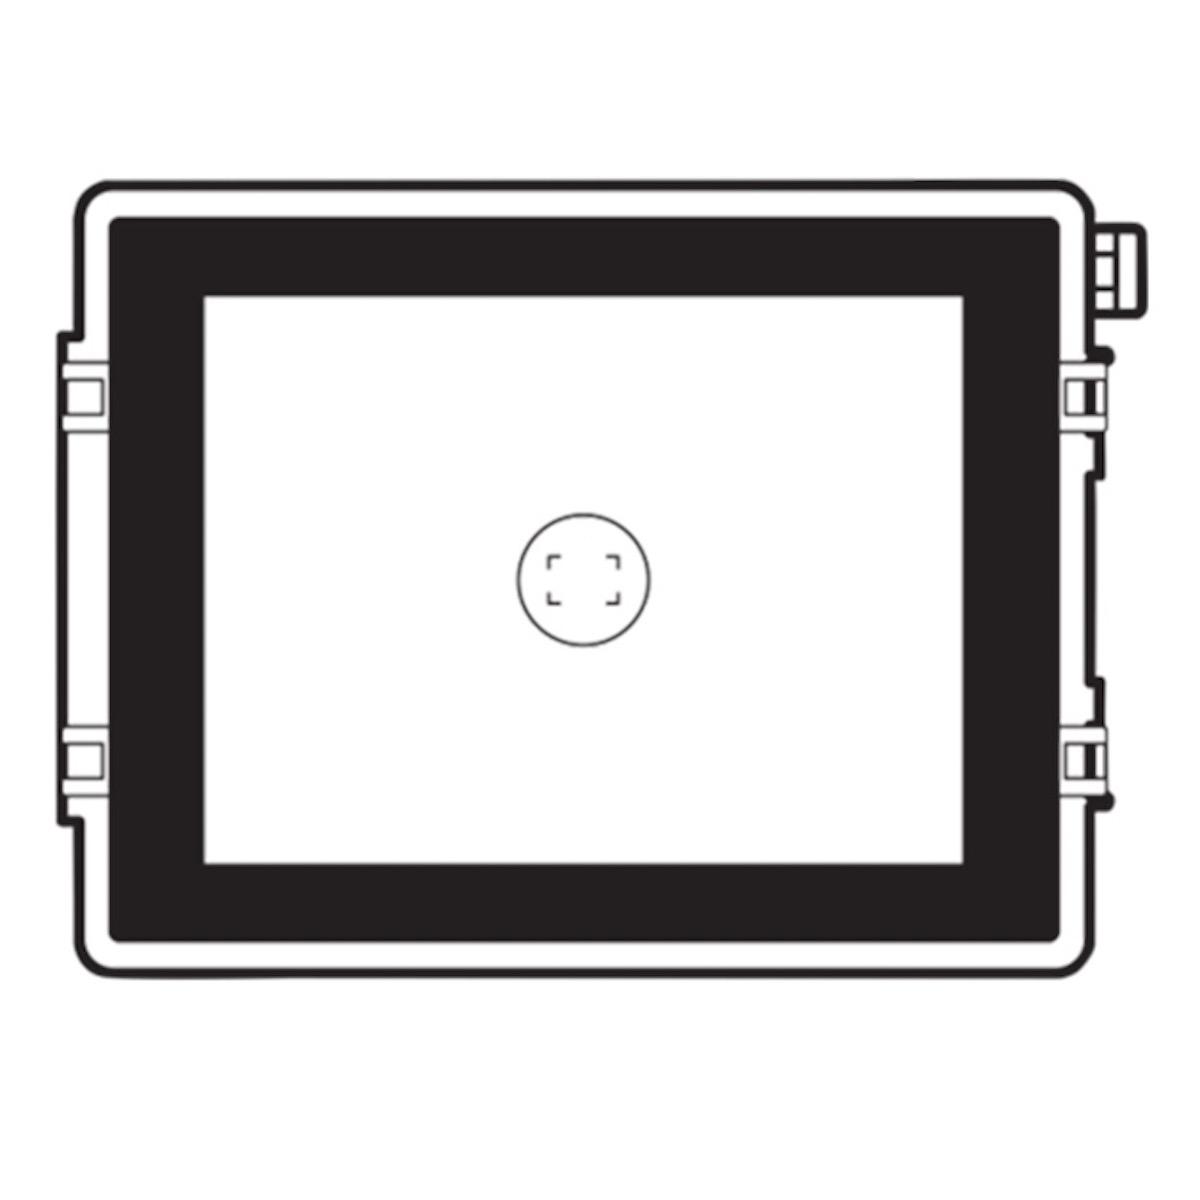 Hasselblad Fokussierscheibe 31/40MP CCD/50MP CMOS